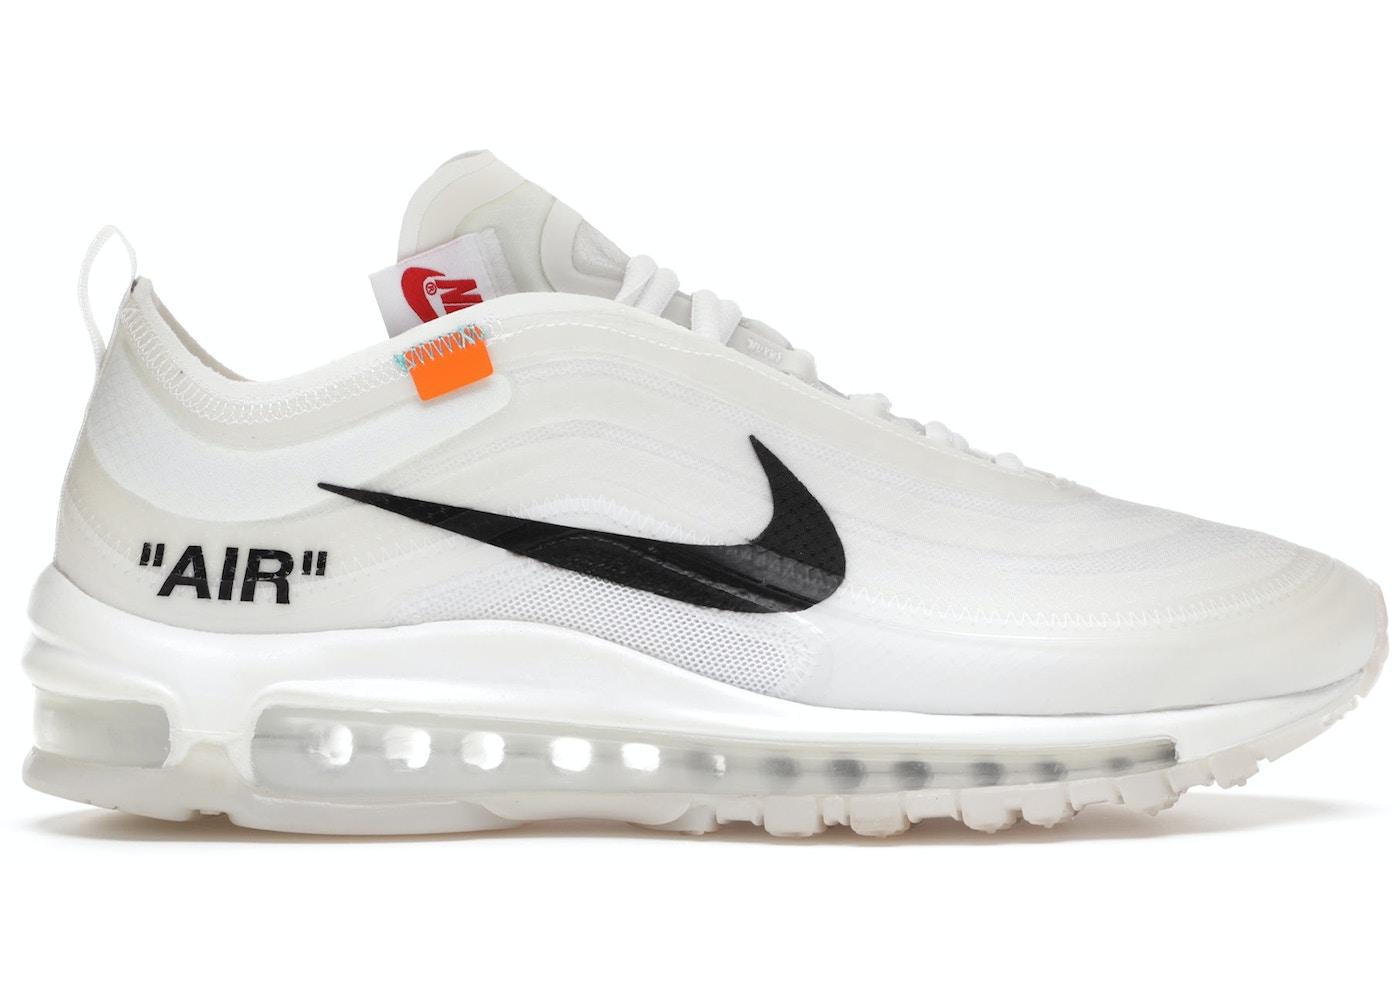 alto Acurrucarse Megalópolis  Nike Air Max 97 Off-White - AJ4585-100